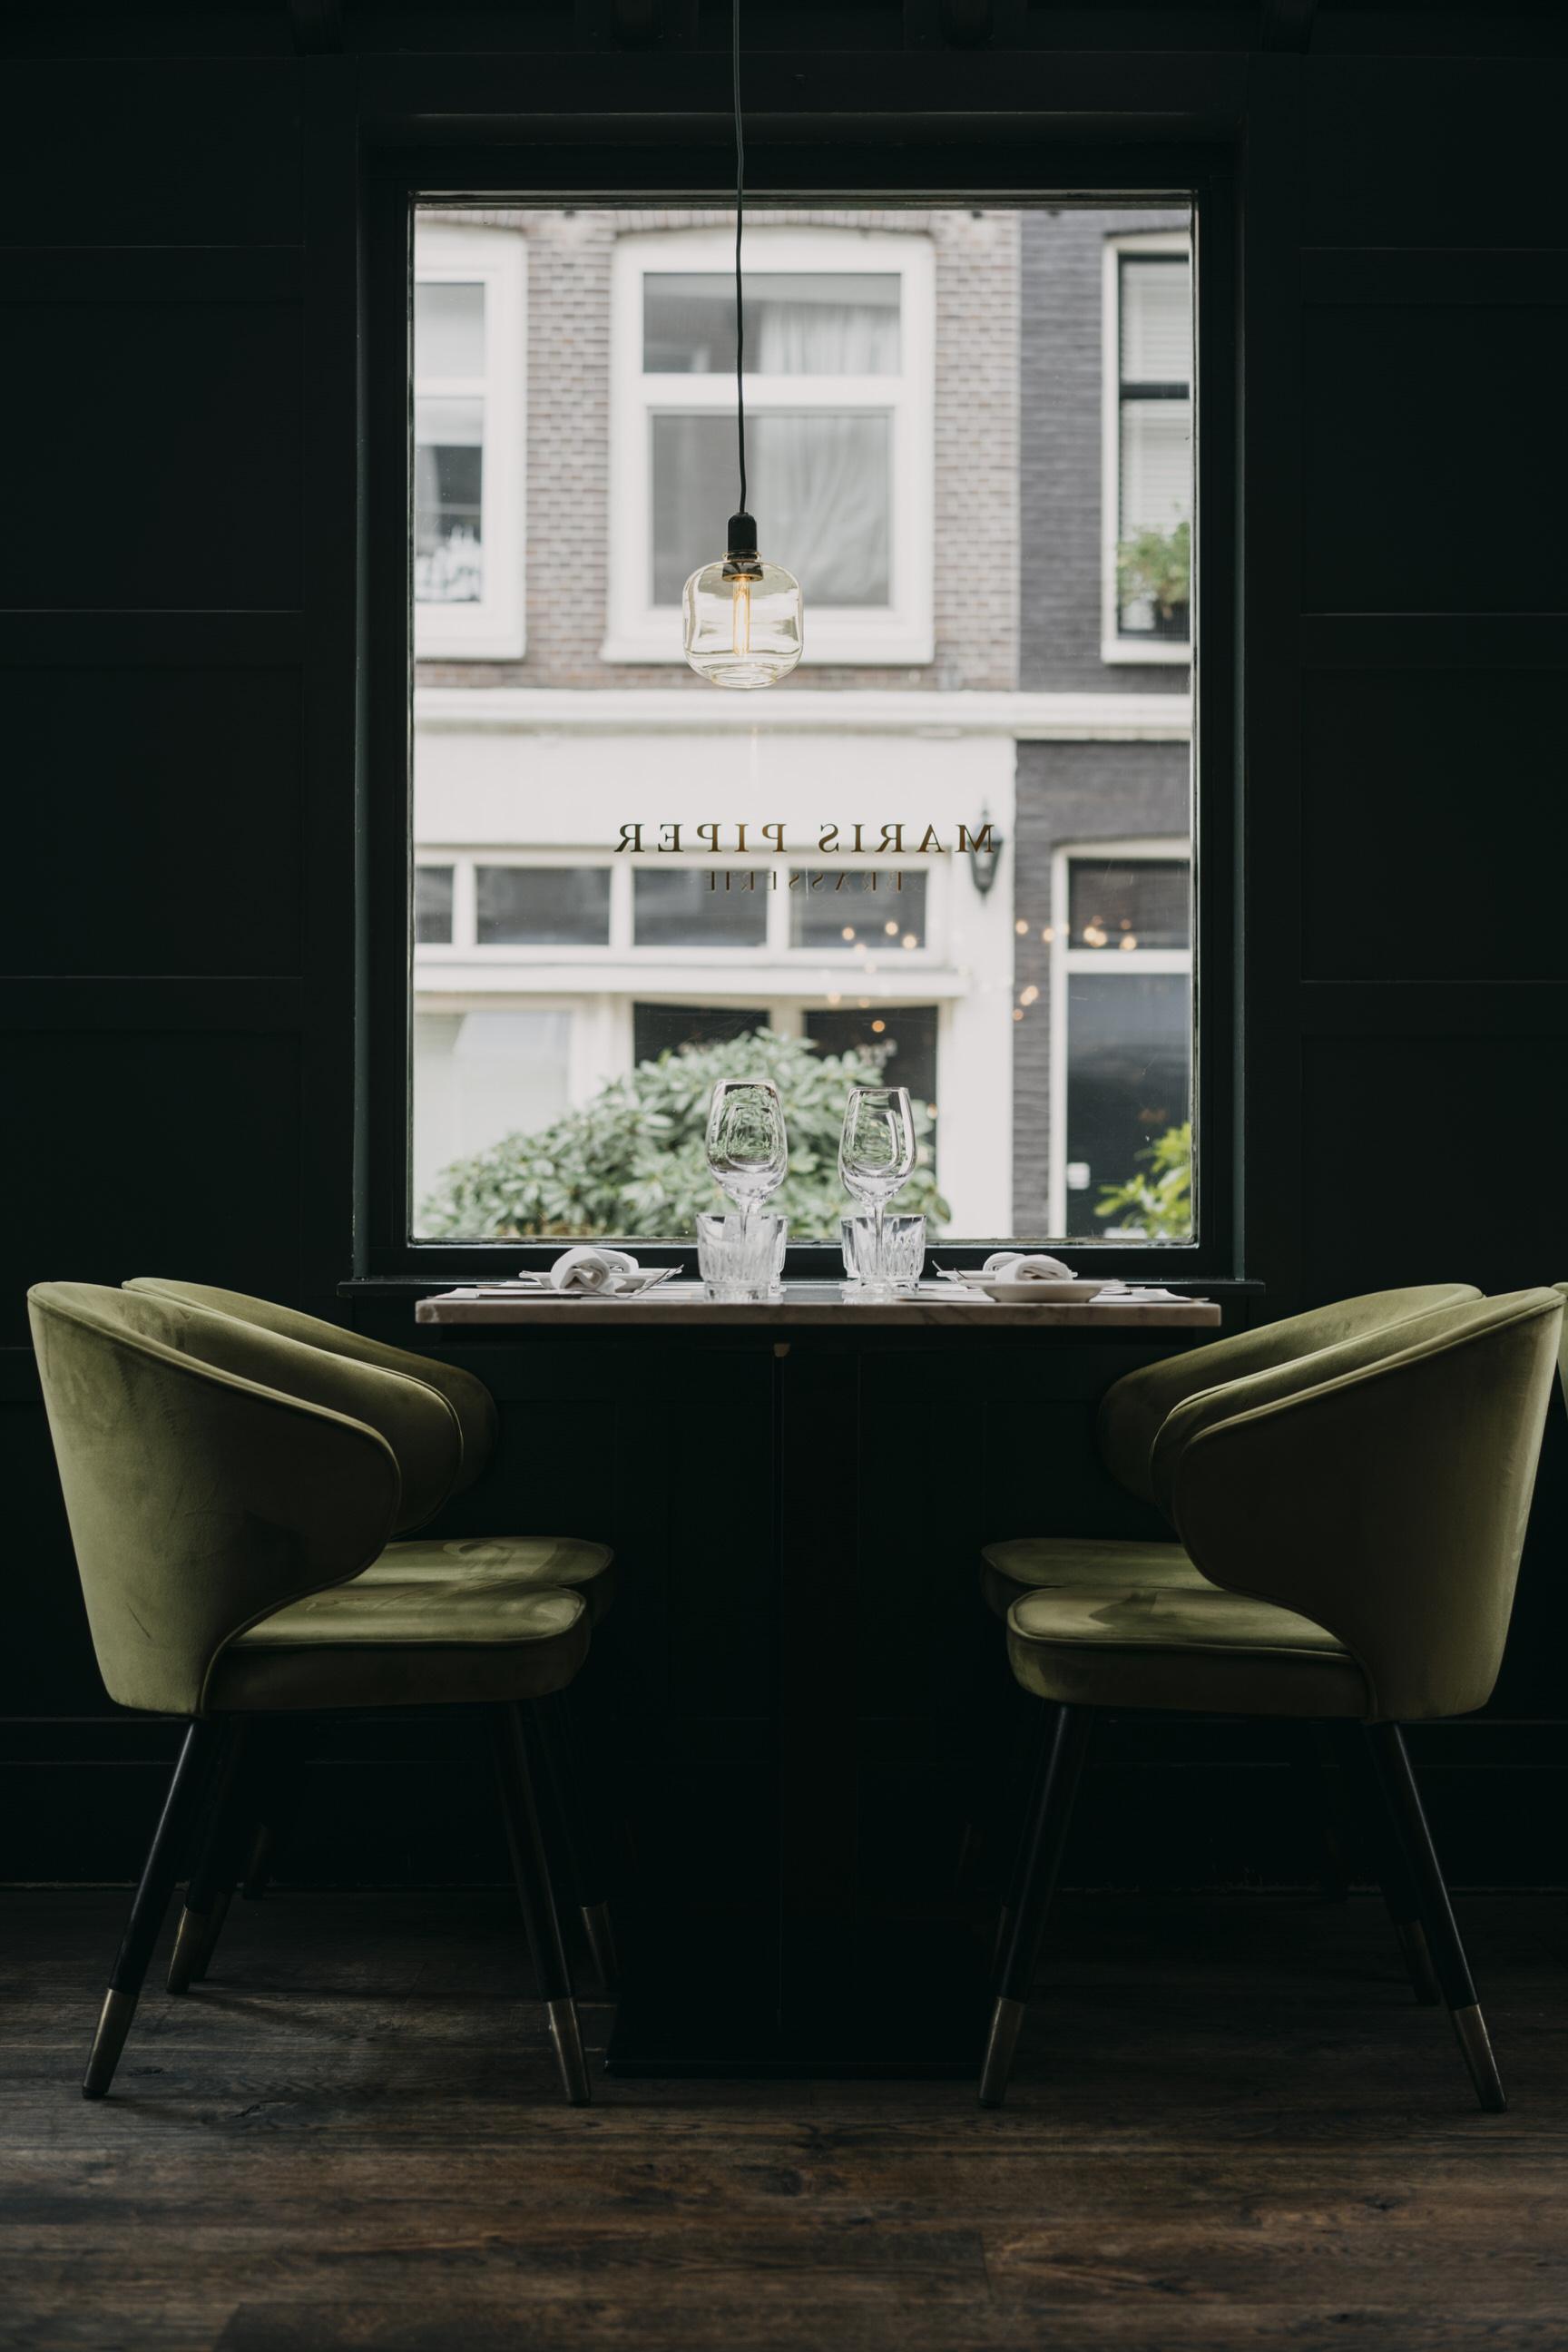 20190228_-_Restaurant_Maris_Piper_-_©_Ch